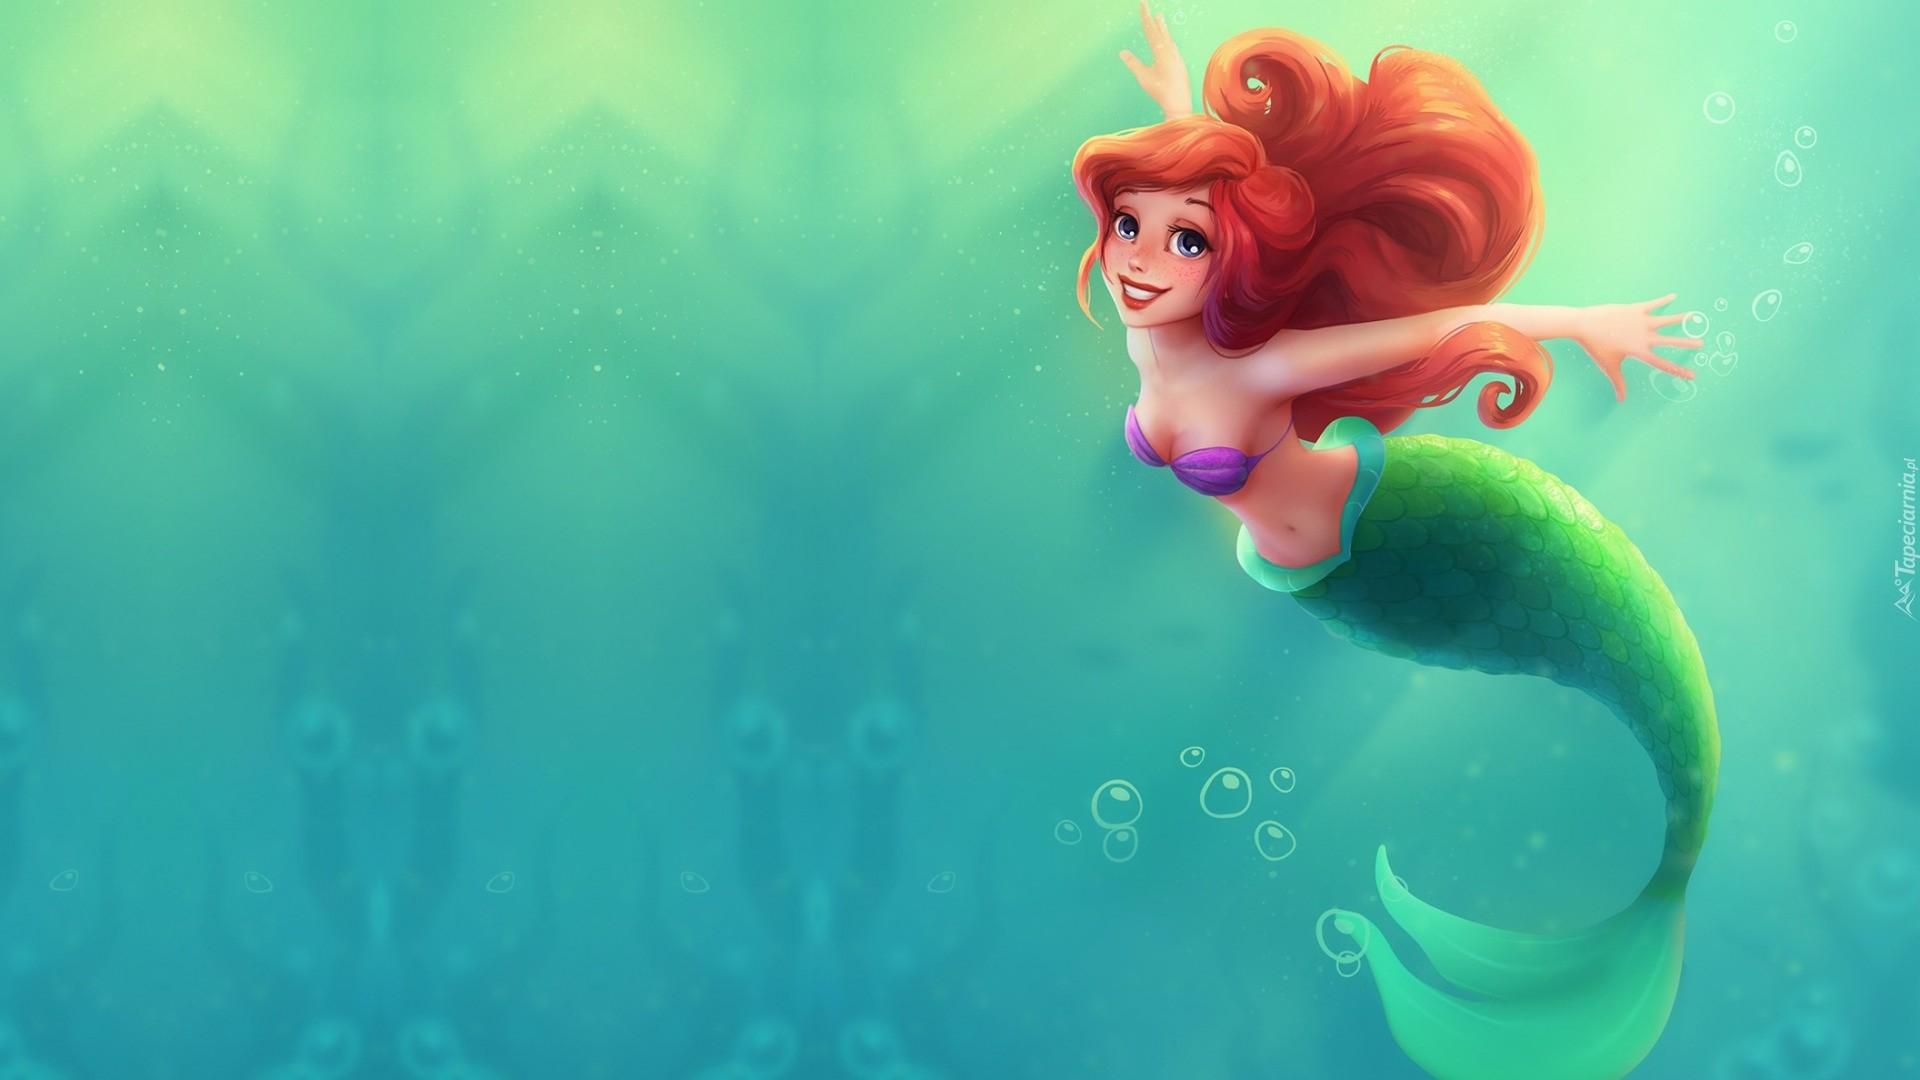 Mermaids desktop wallpaper hd